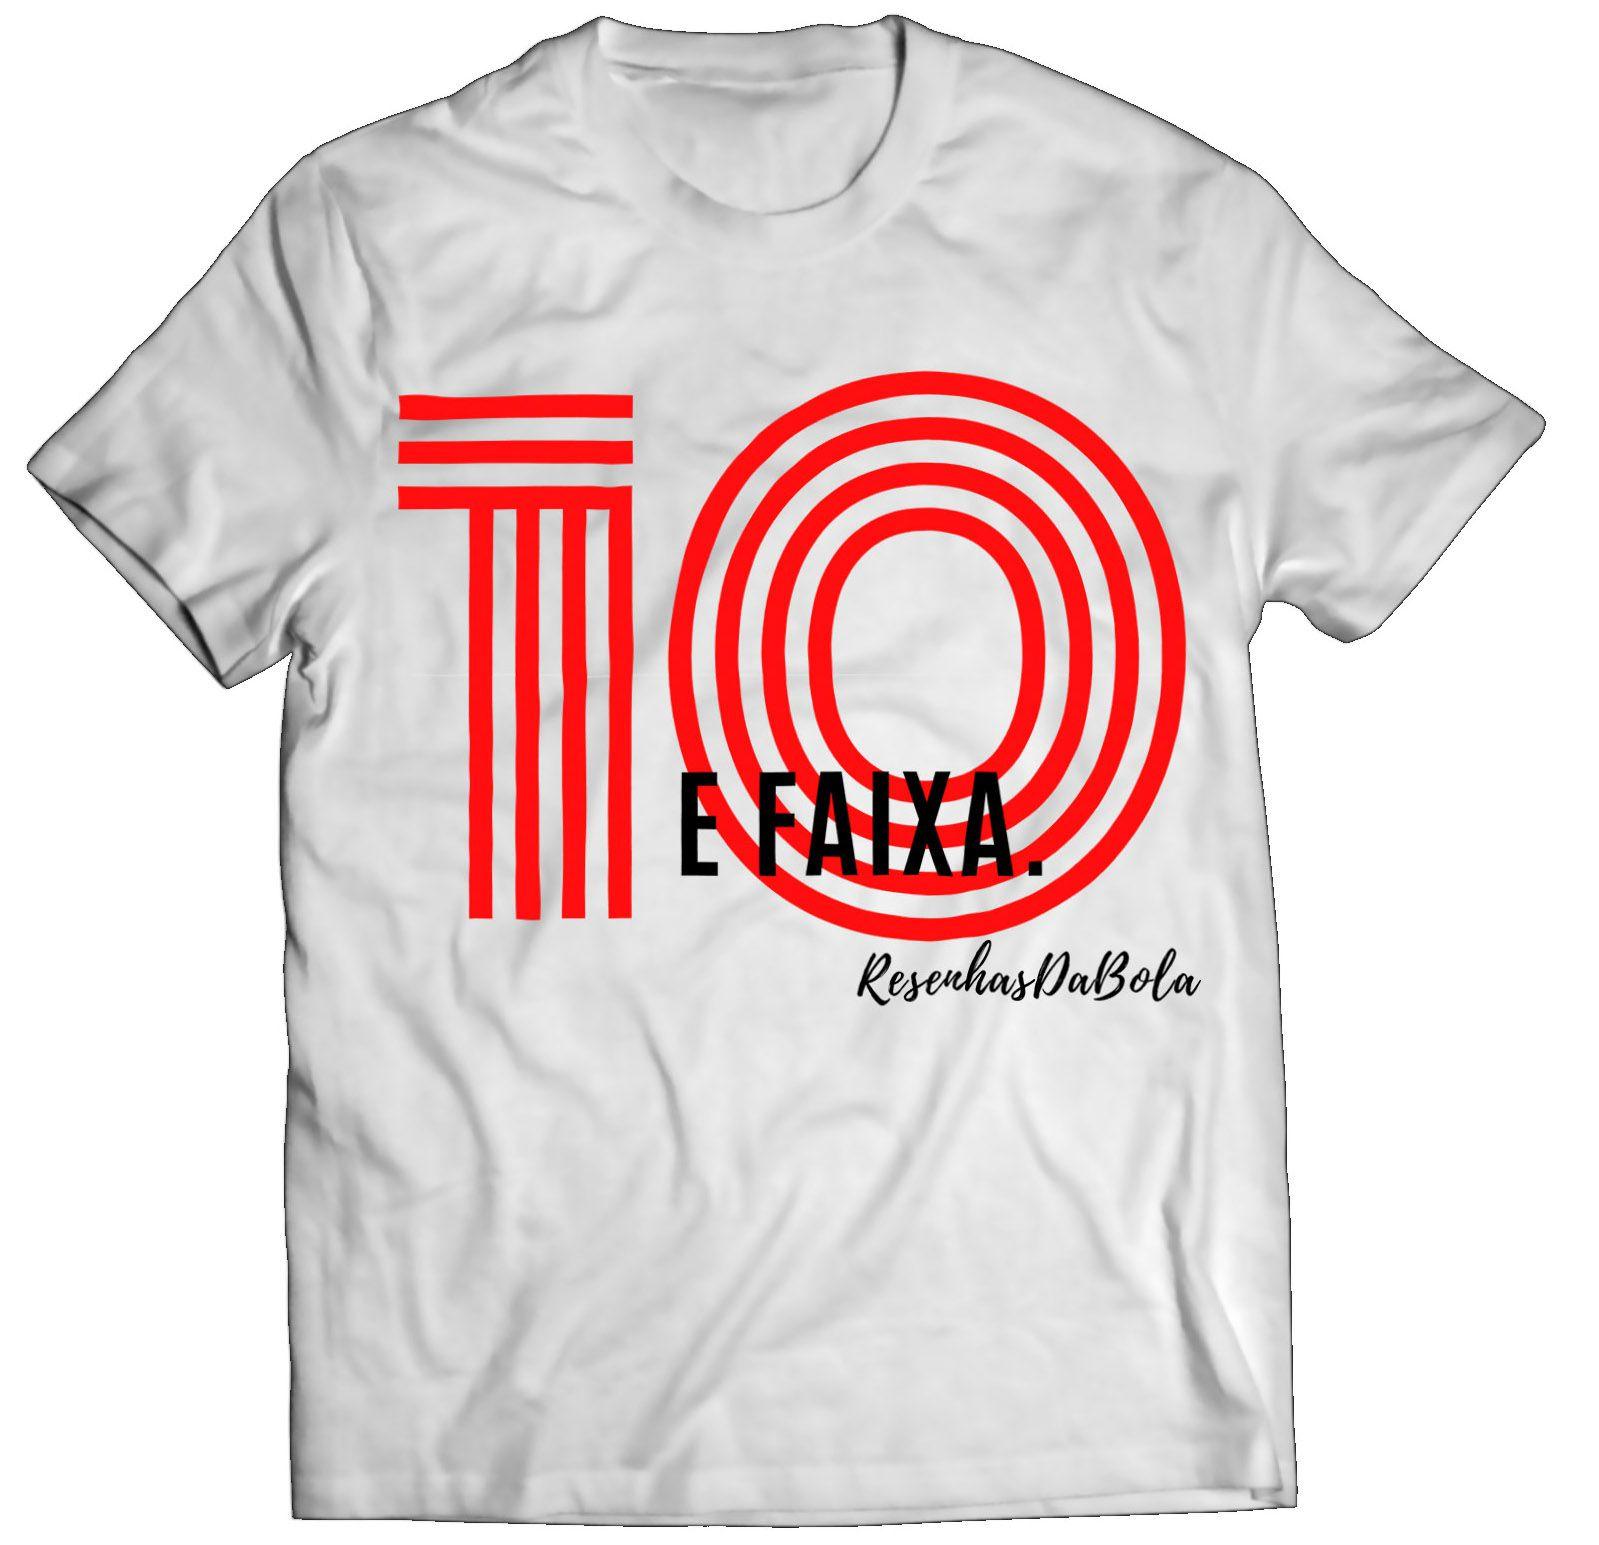 Camiseta - 10 E FAIXA - Masculino